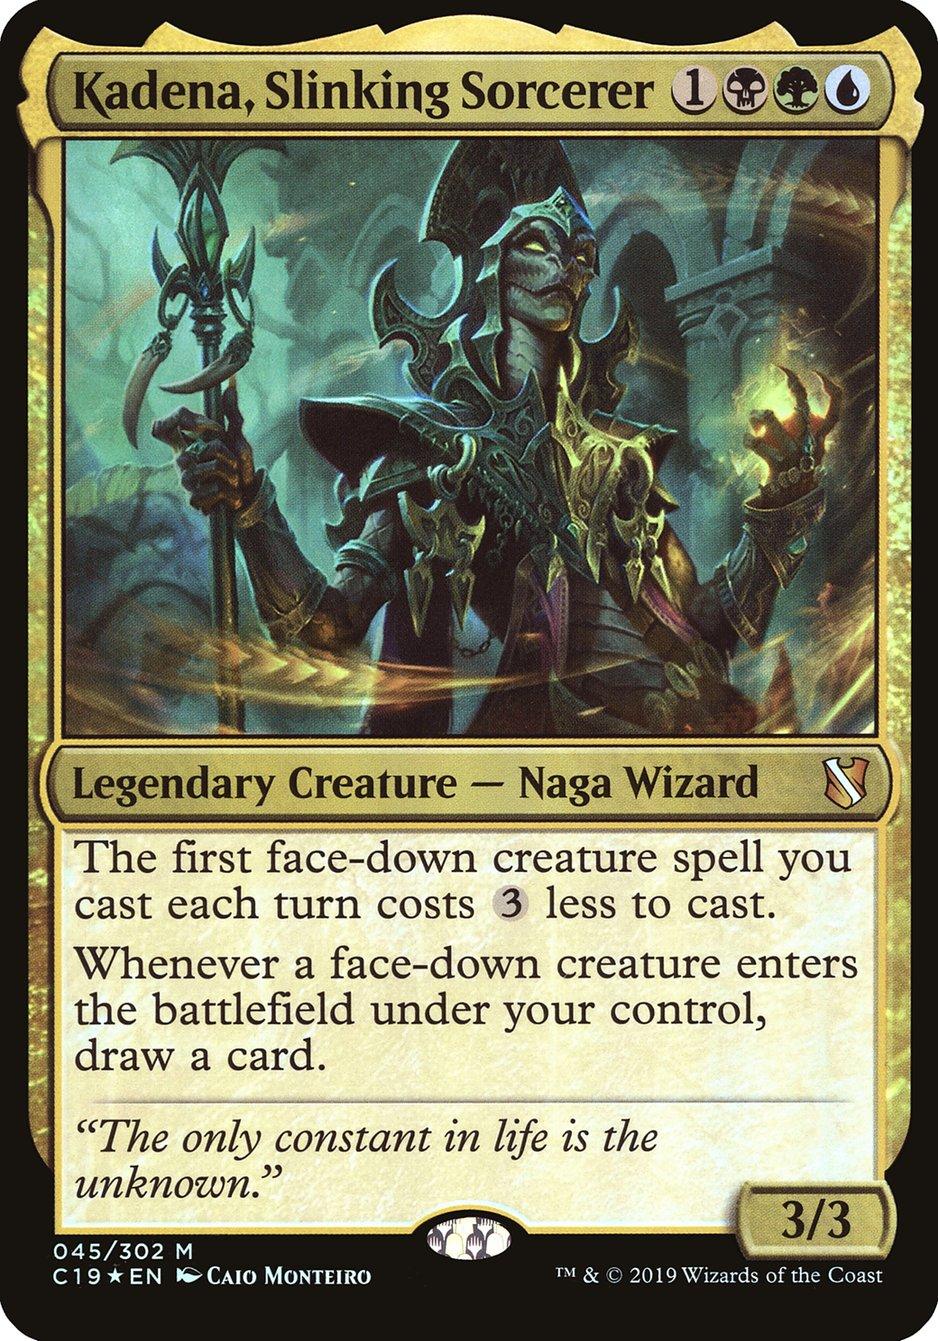 Carta Kadena, Feiticeira Serpentil/Kadena, Slinking Sorcerer de Magic the Gathering